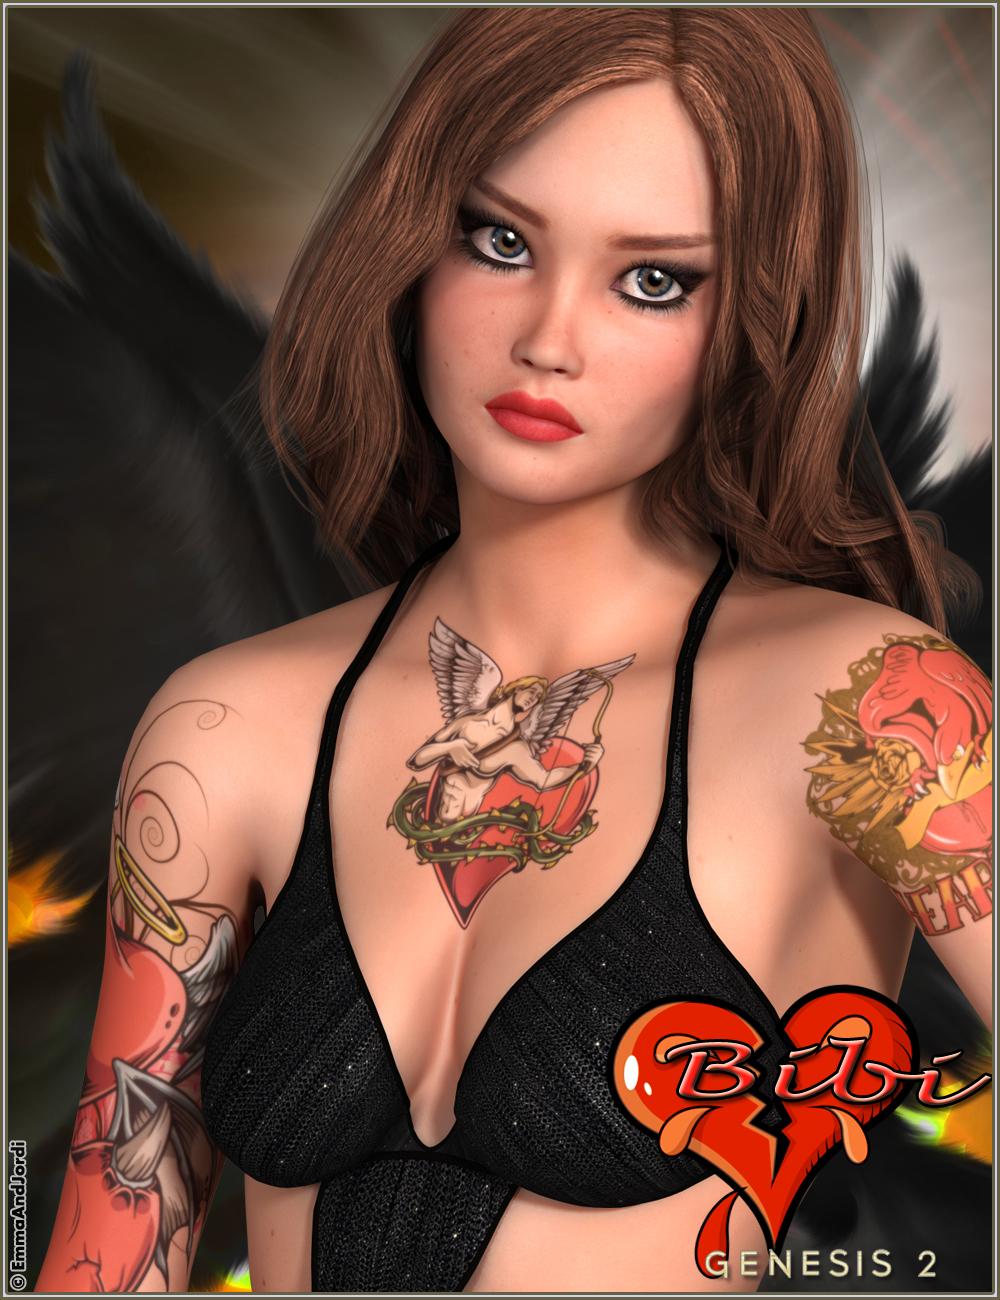 EJ Bibi by: EmmaAndJordi, 3D Models by Daz 3D